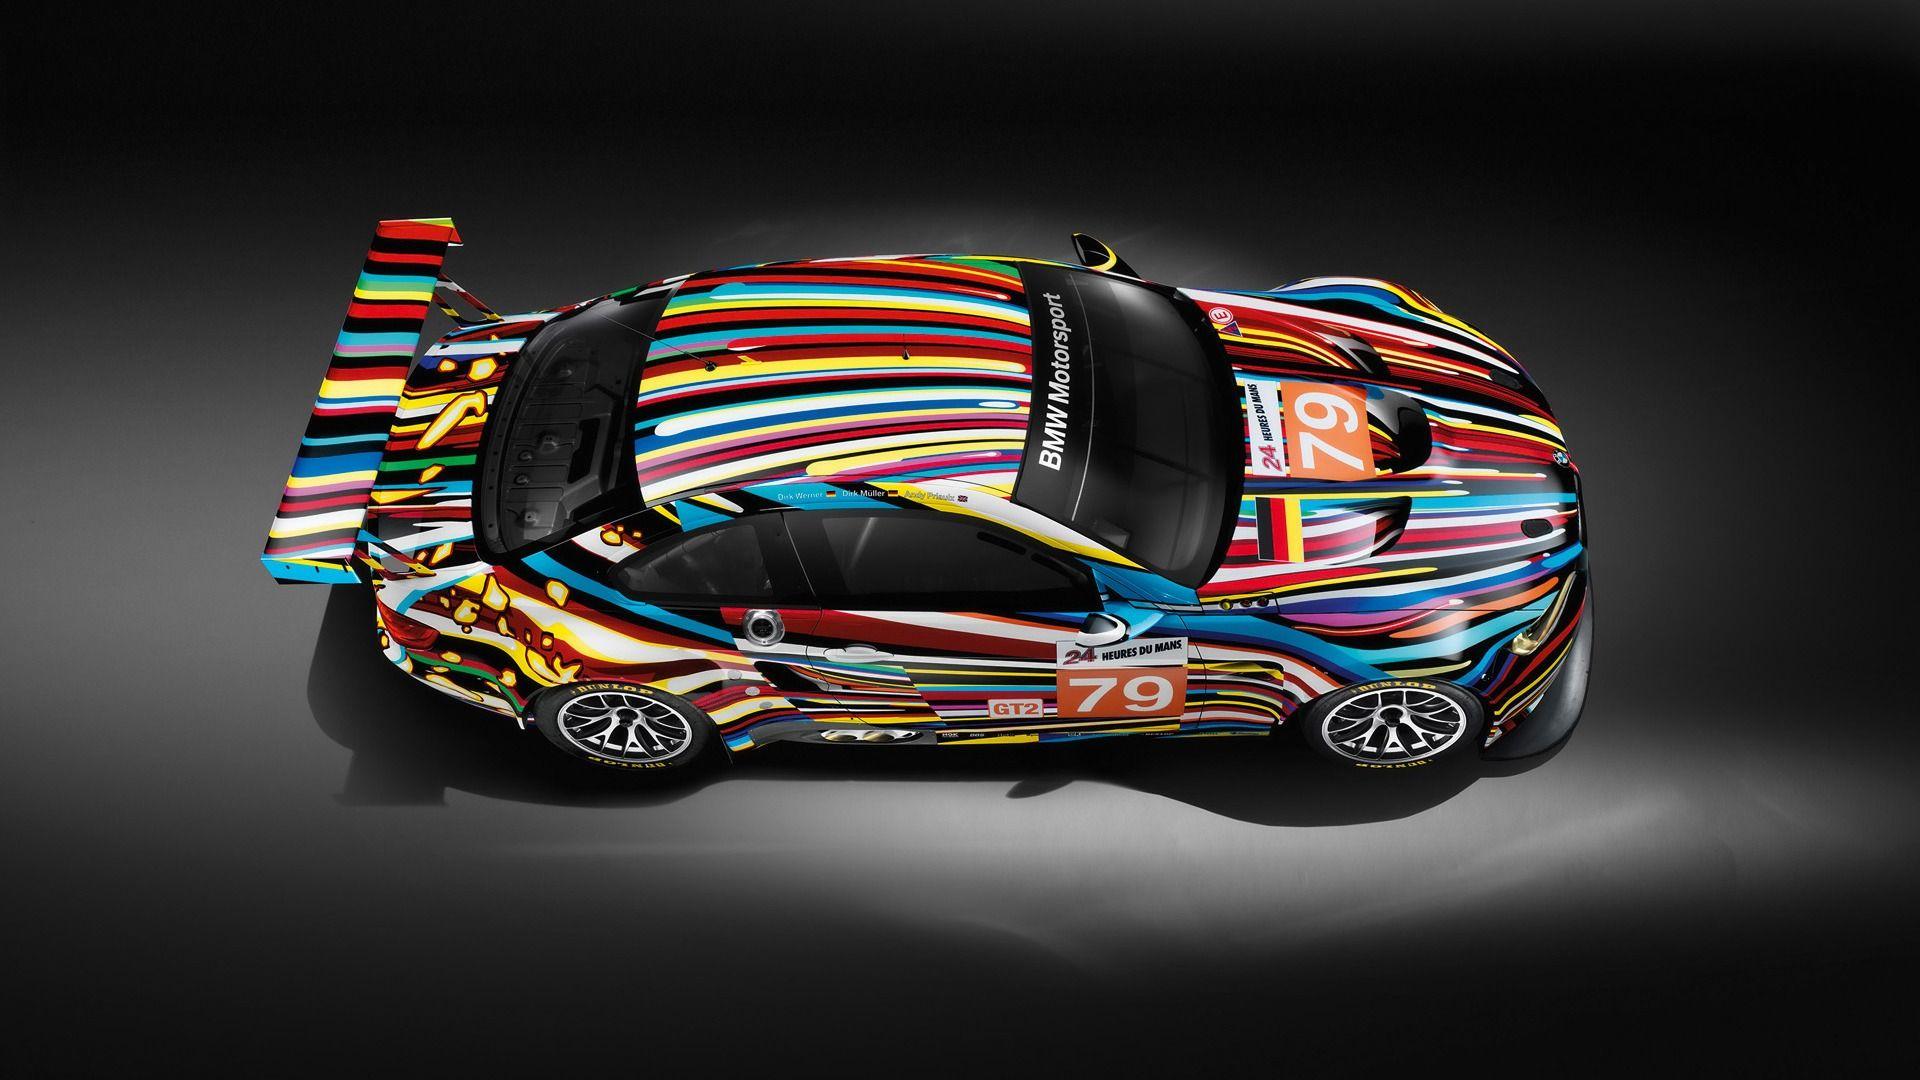 Jeff Koons Bmw M3 Gt2 Art Car Revealed Gallery 1 Bmw Art Car Art Art Cars